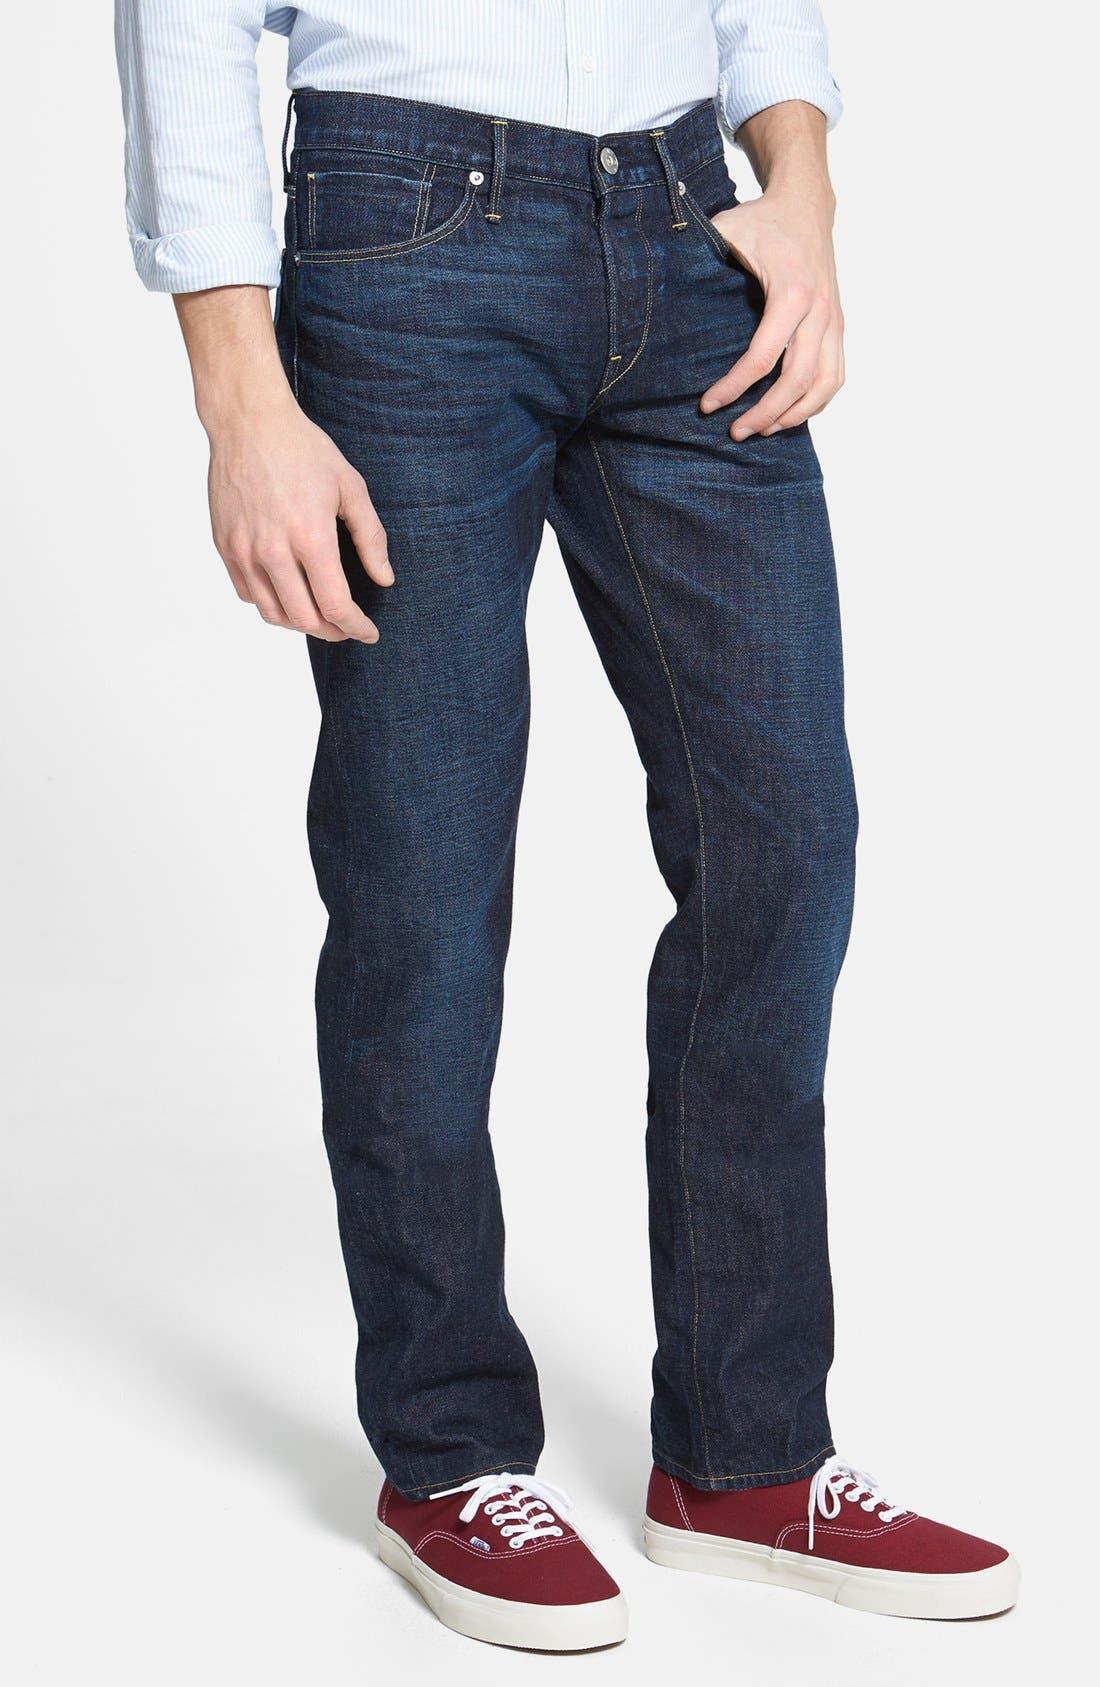 Main Image - 3x1 NYC 'M4' Straight Leg Selvedge Jeans (Walker)